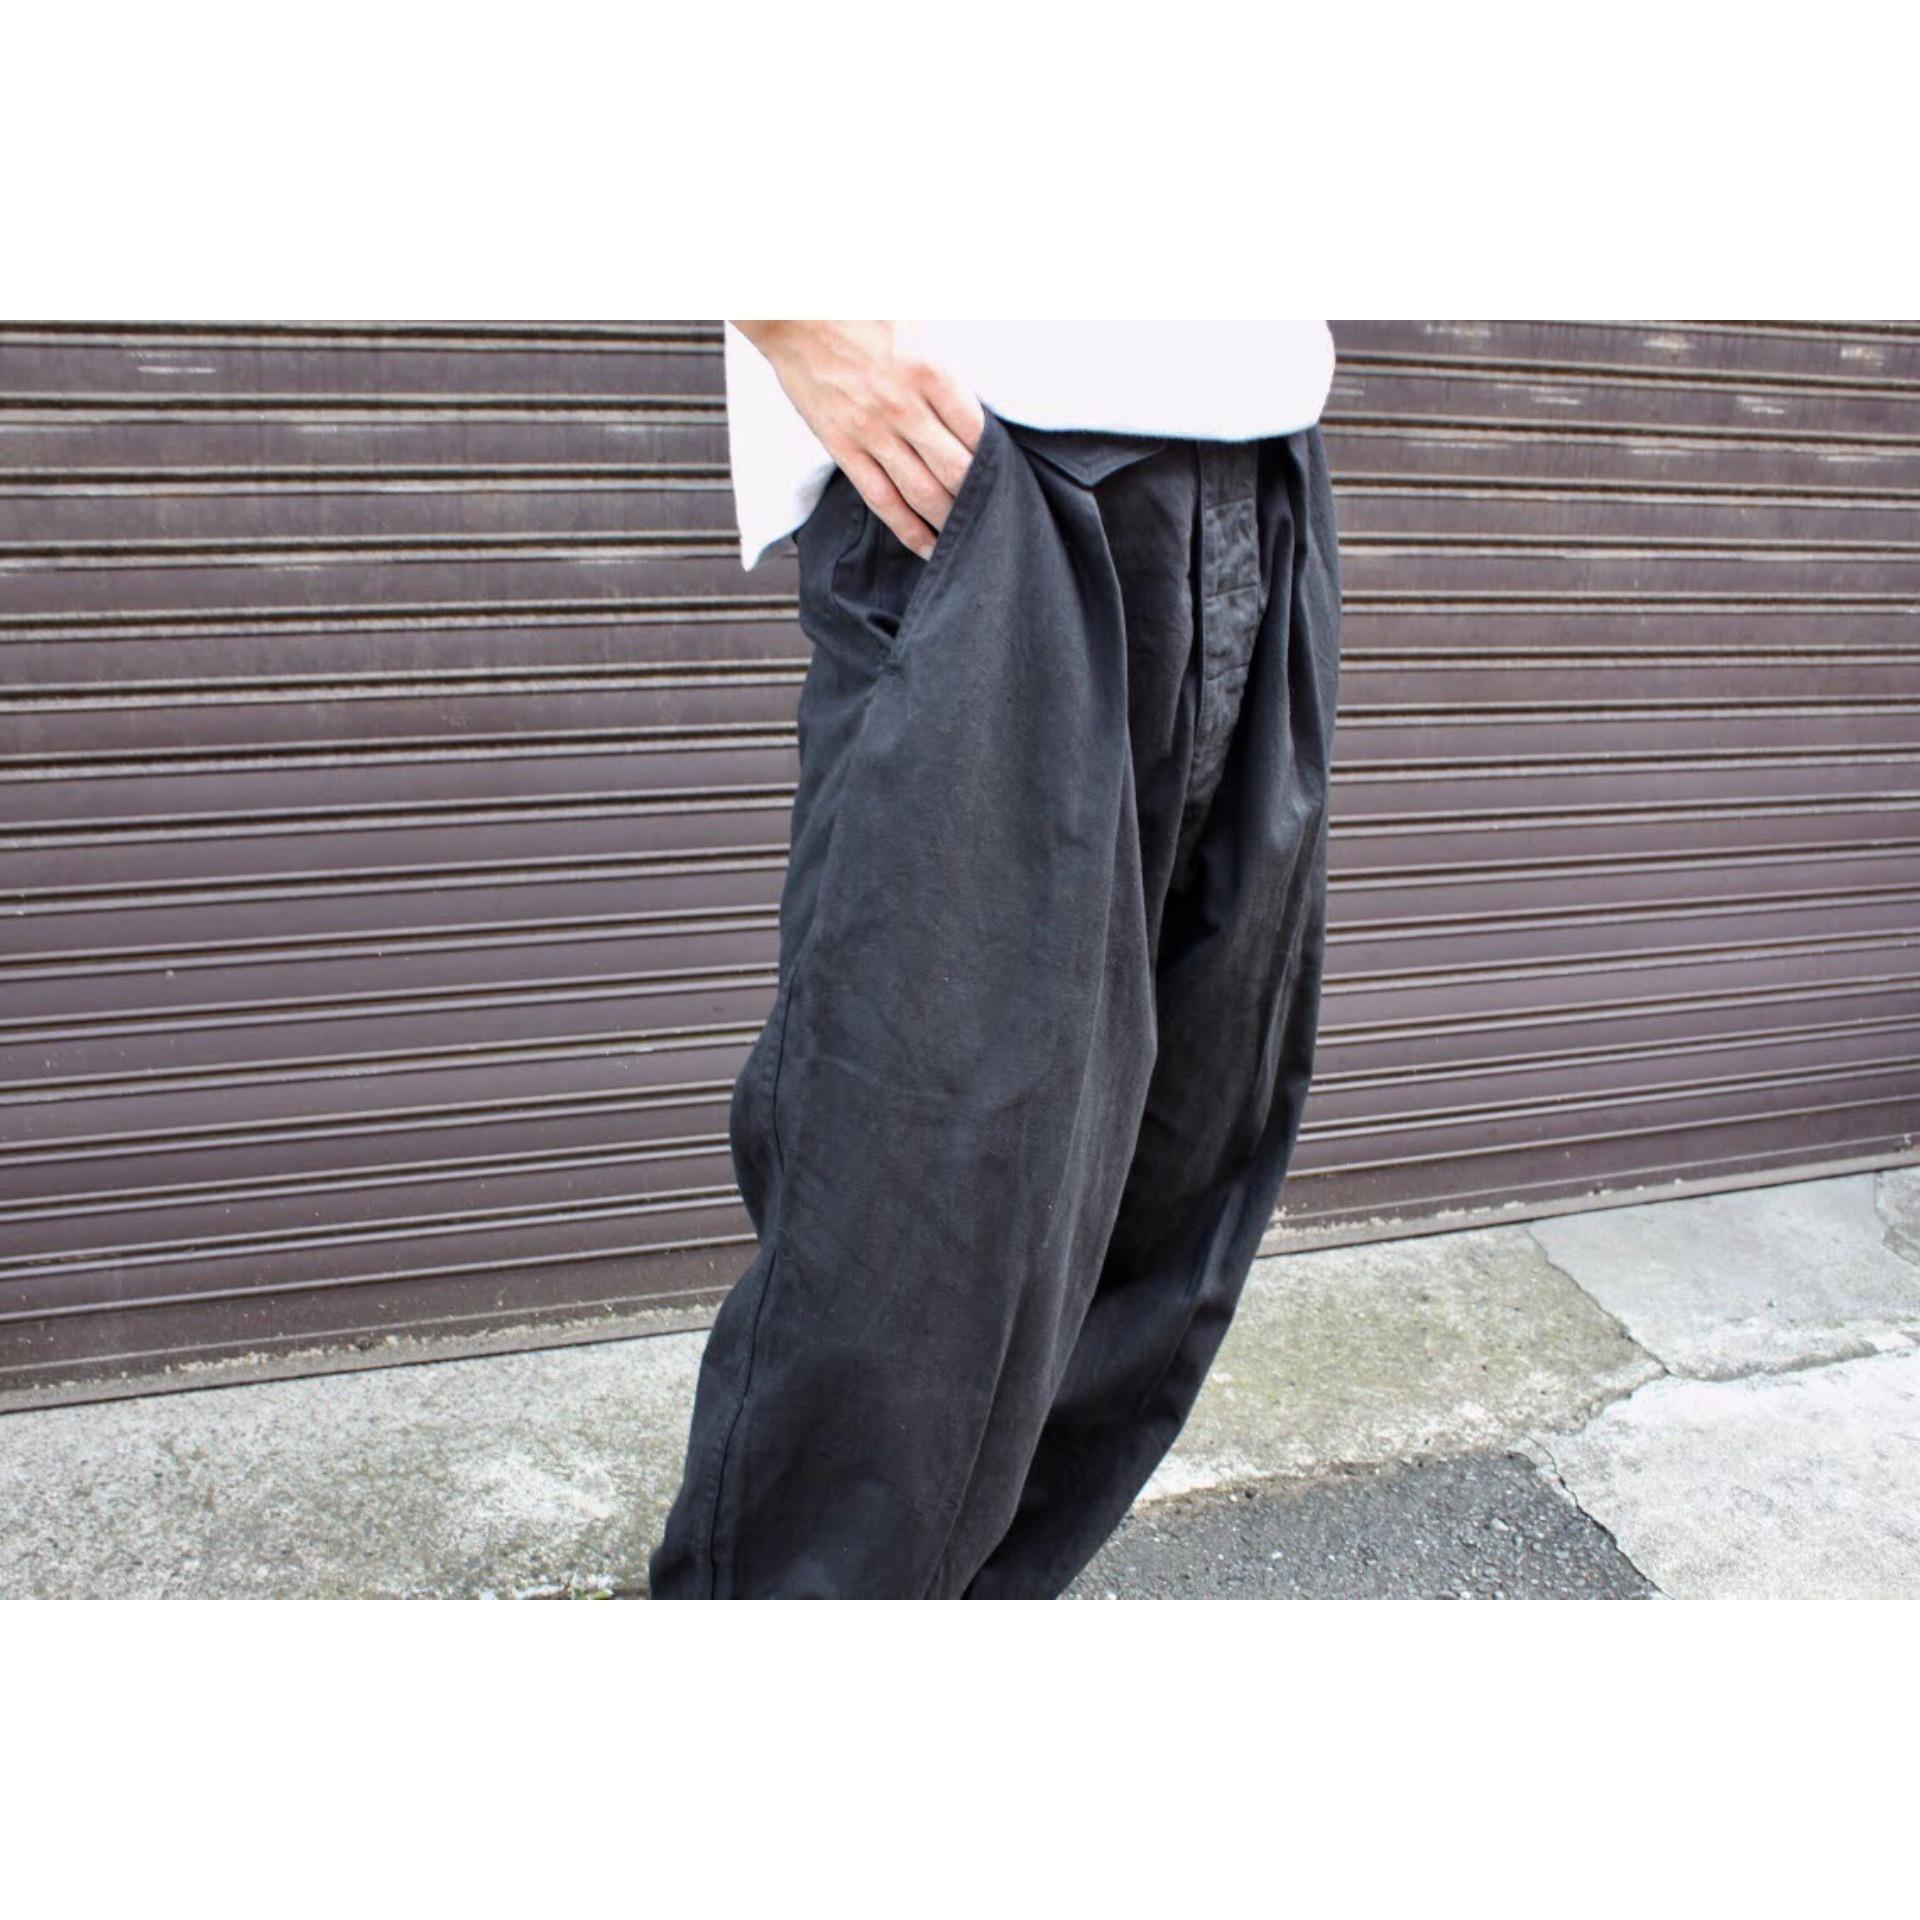 Vintage baggy silhouette pants by Katharin Hamnett